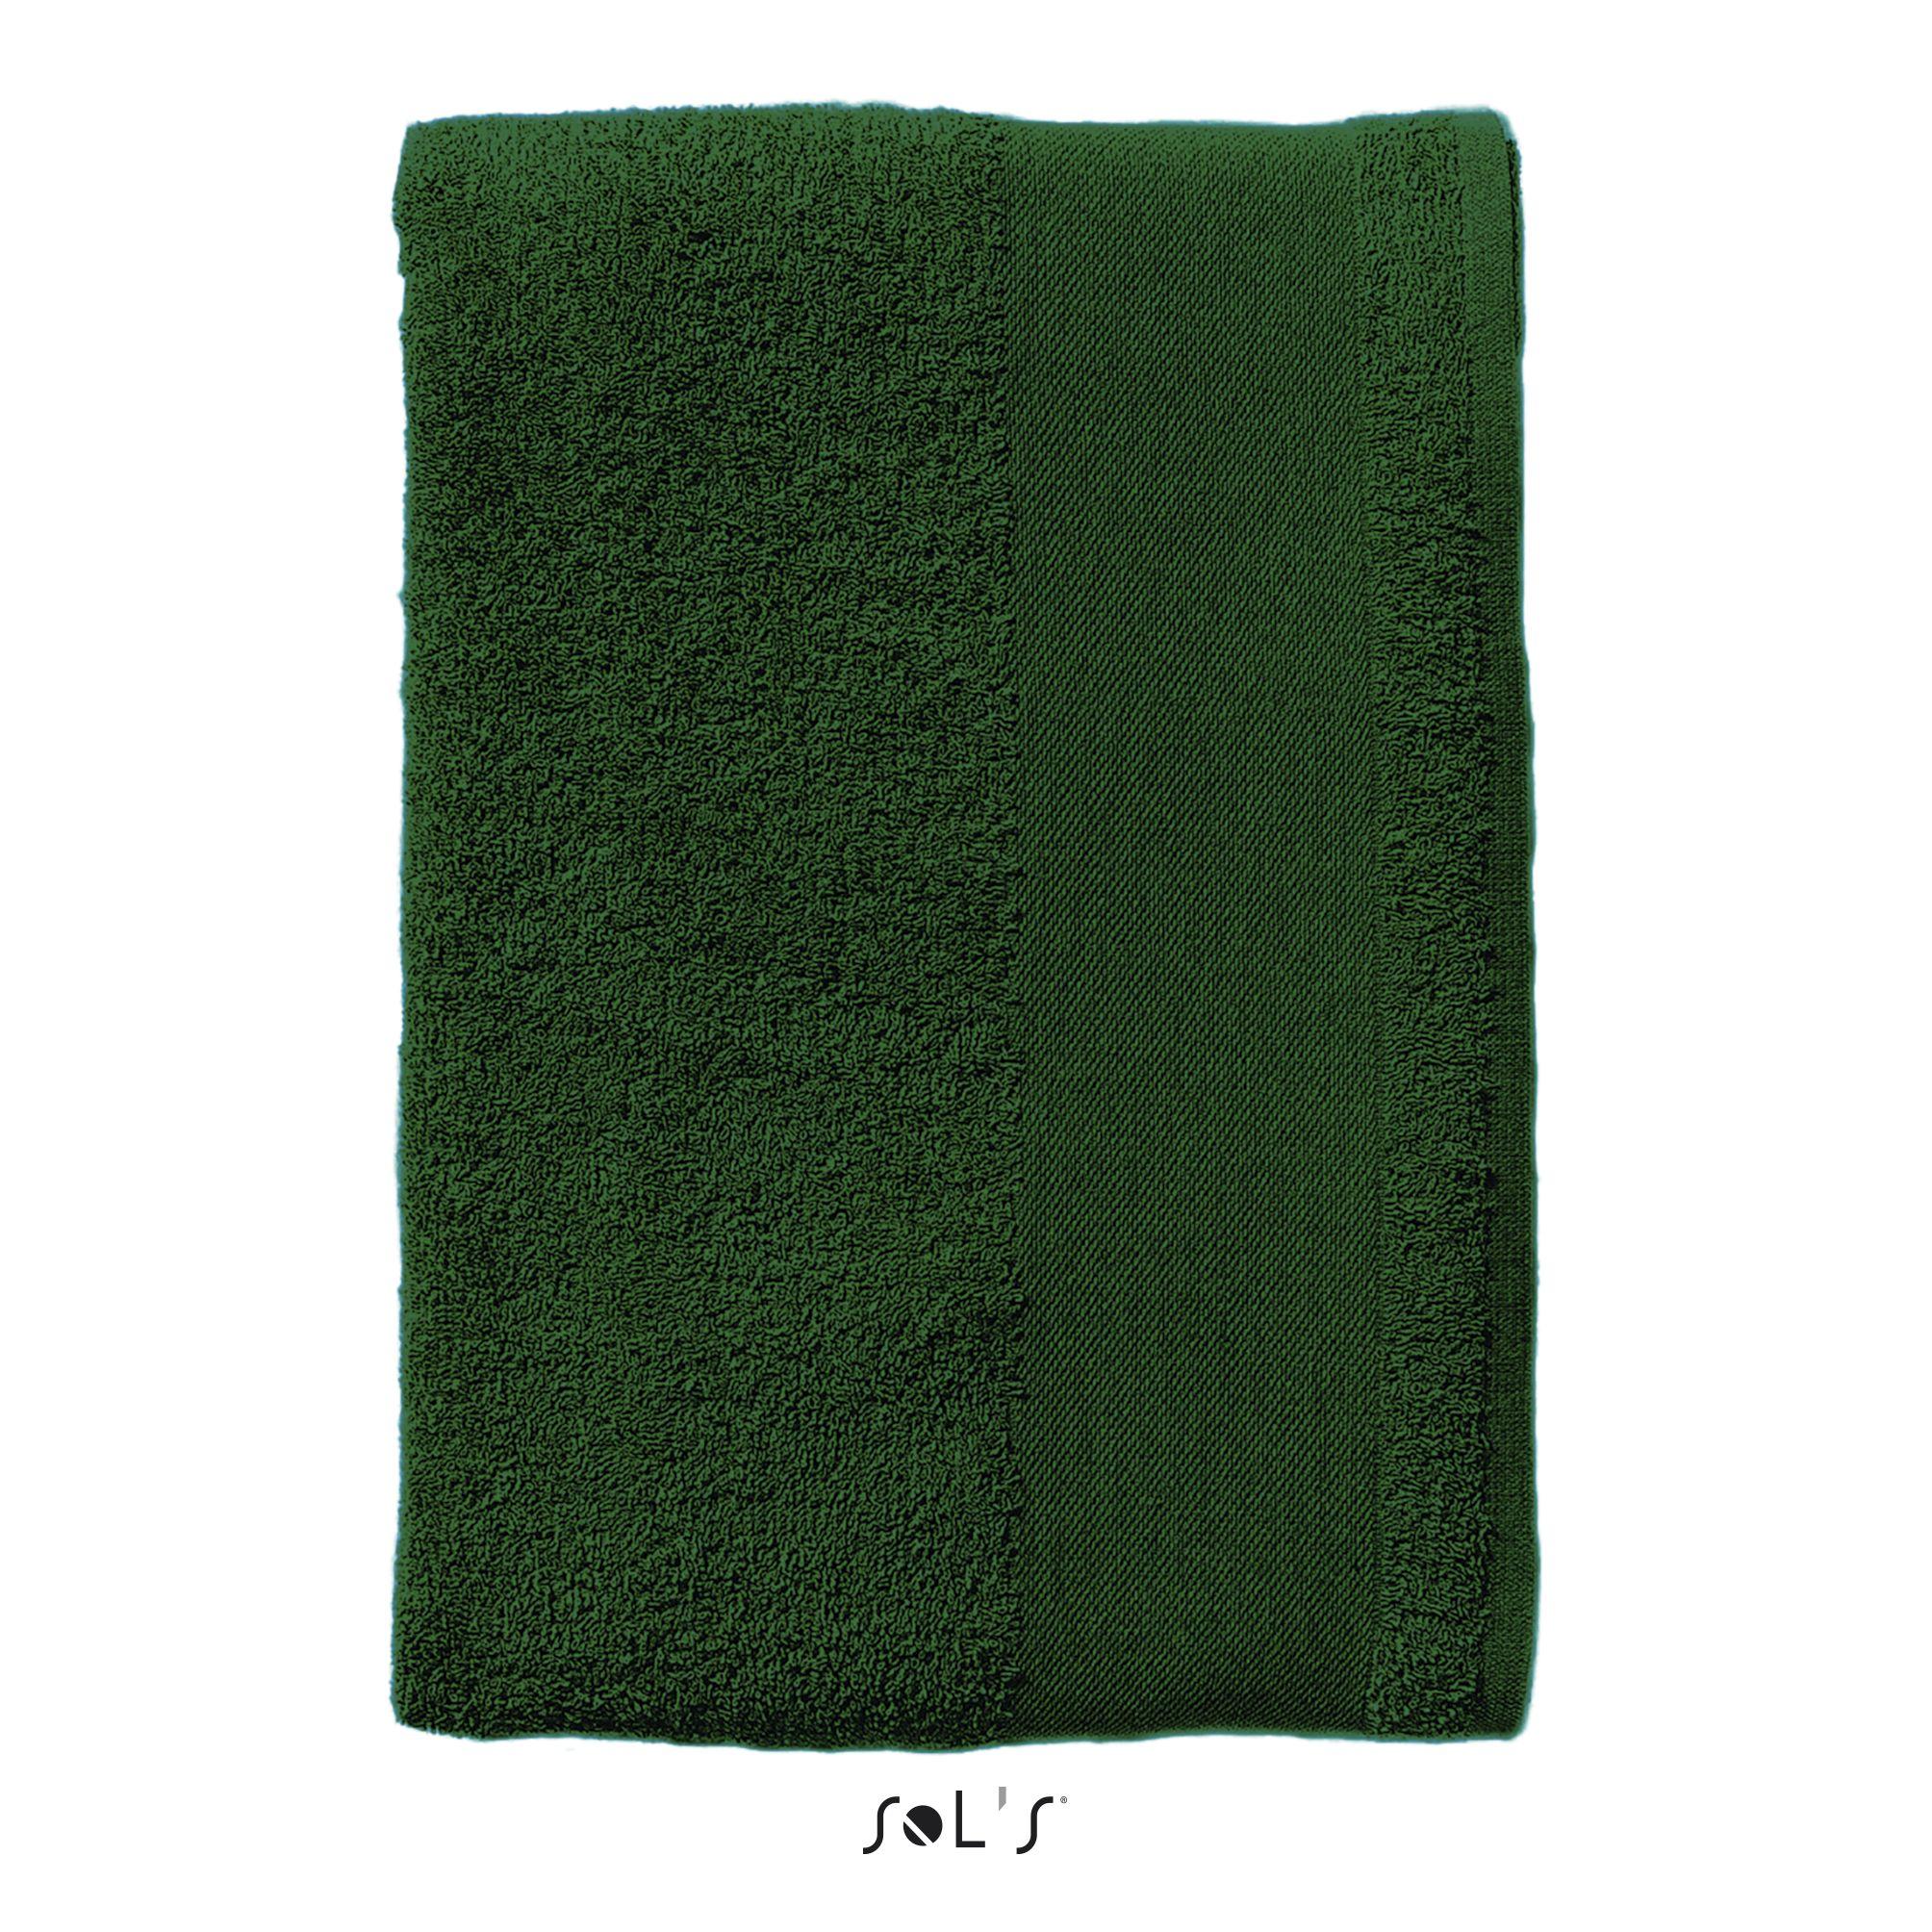 264 - Bottle green